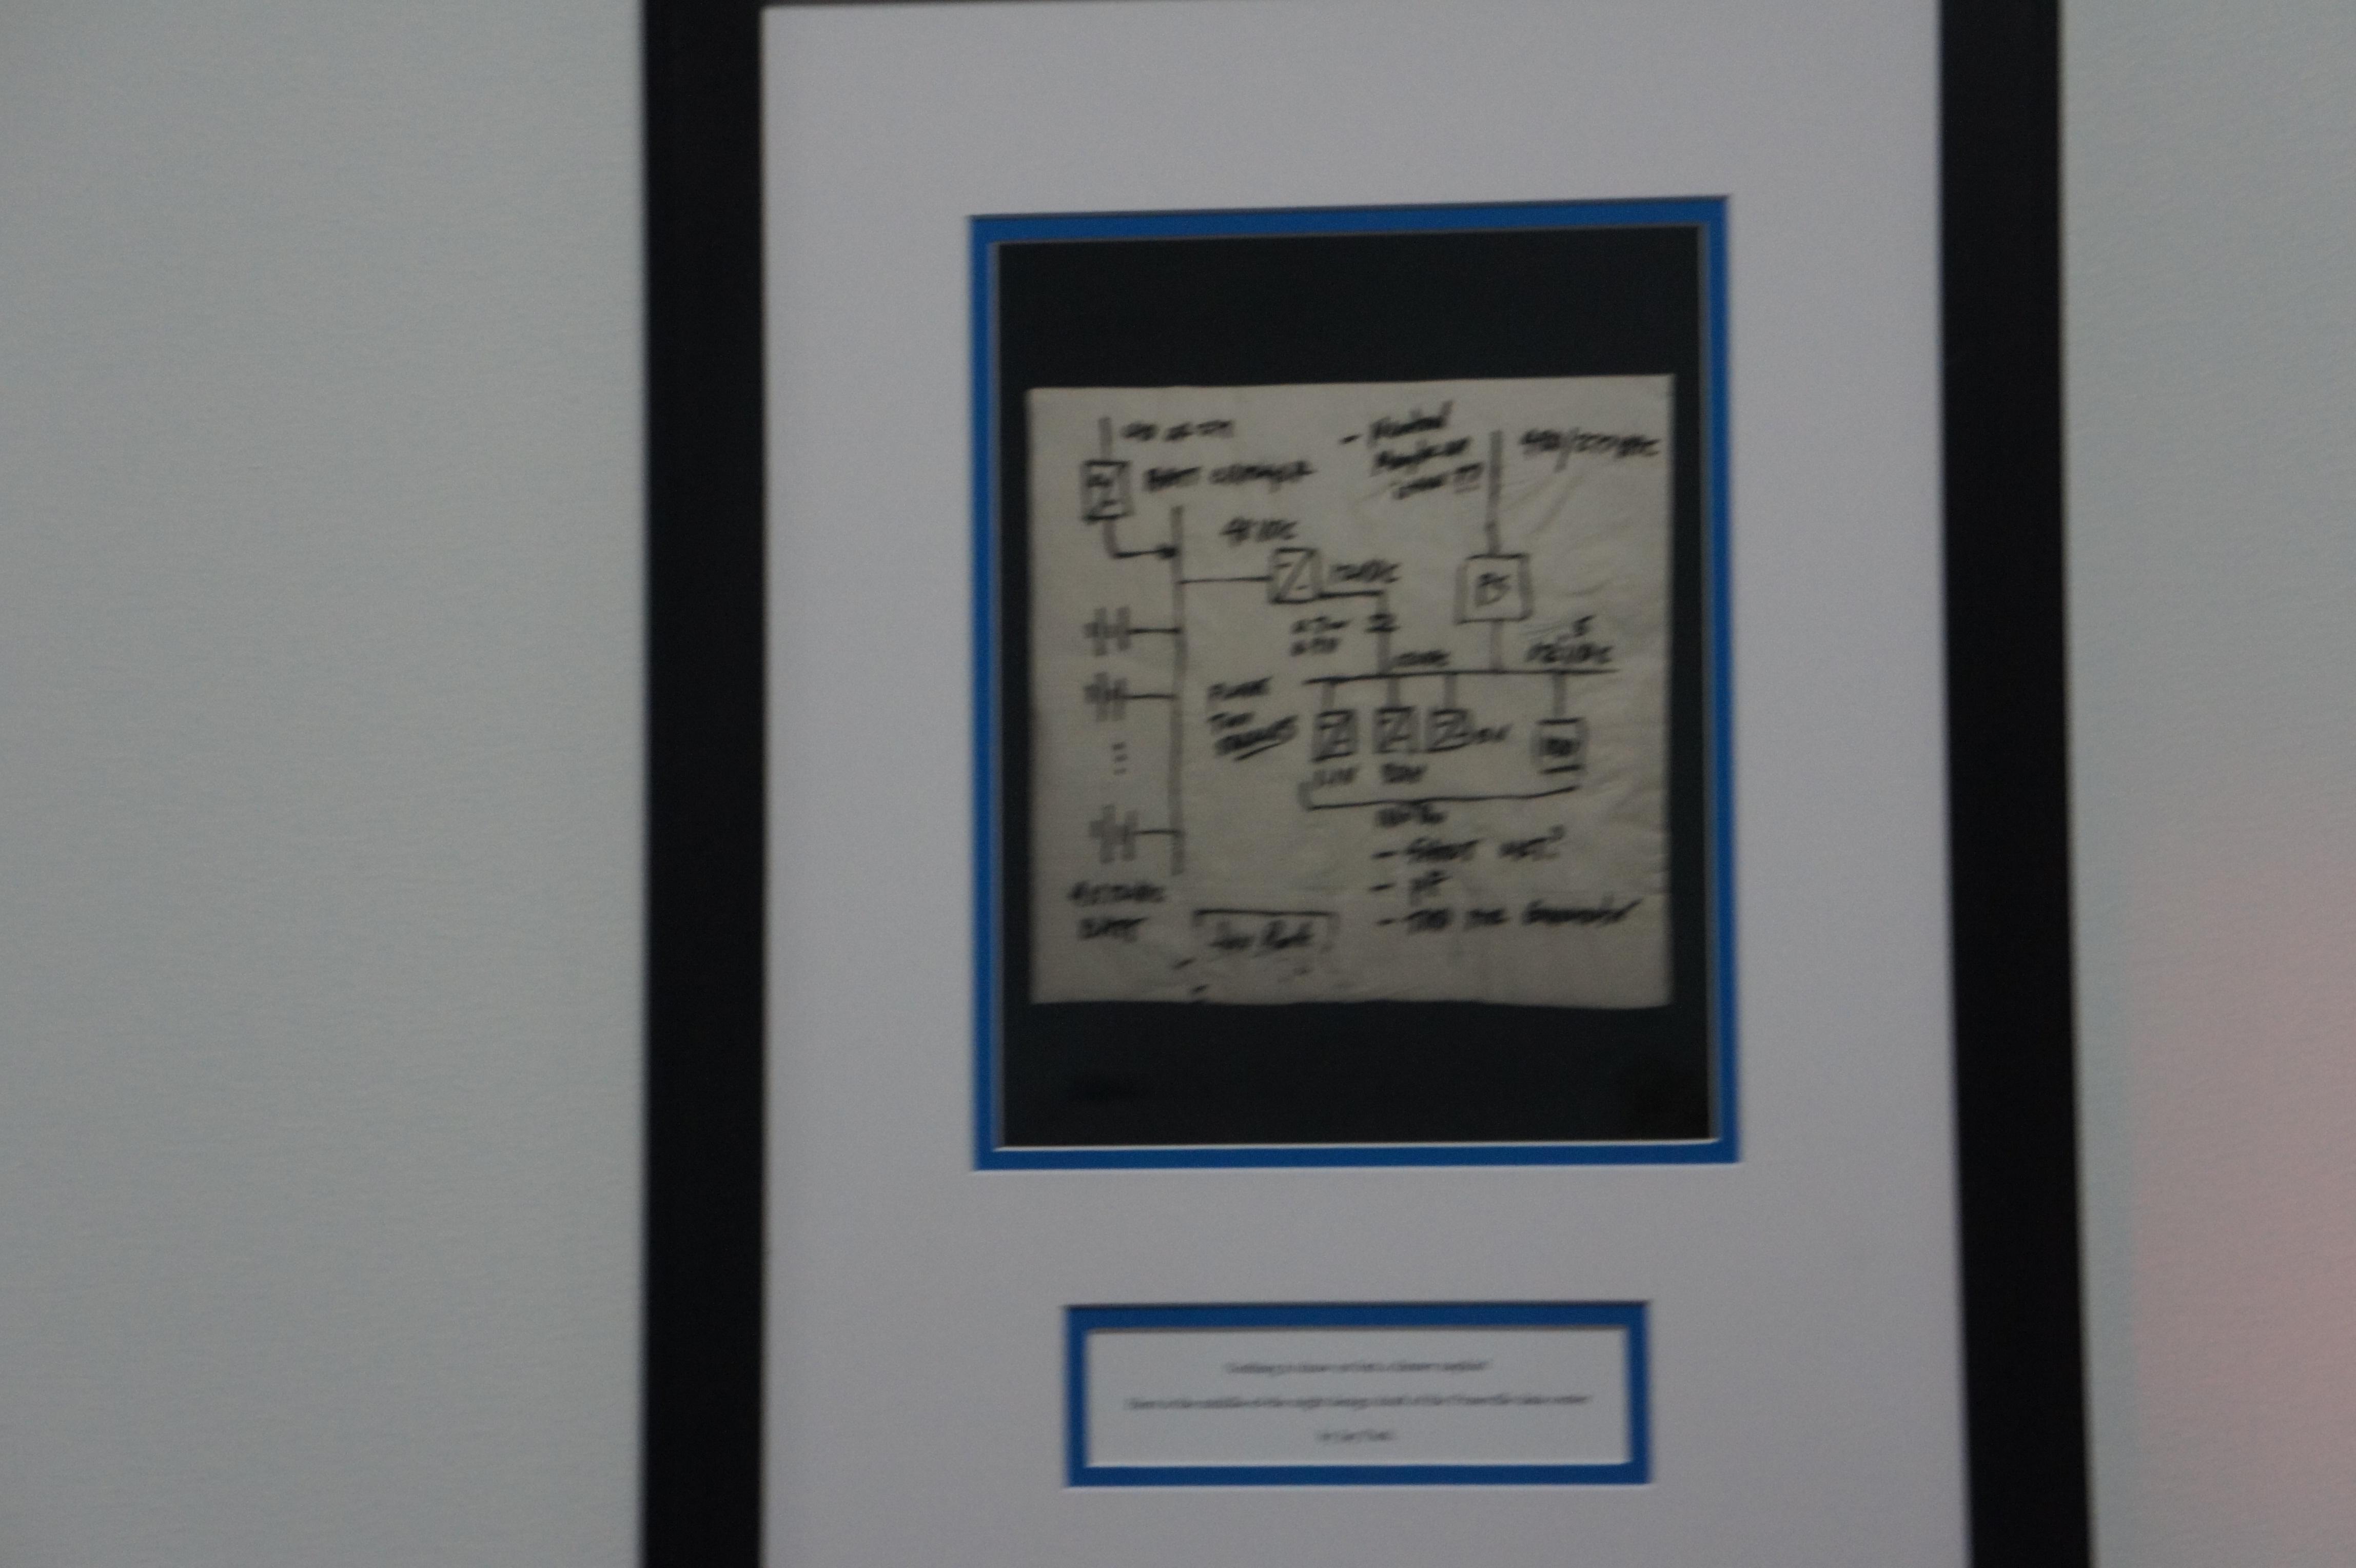 Napkin of original design of power plan for Facebook data center